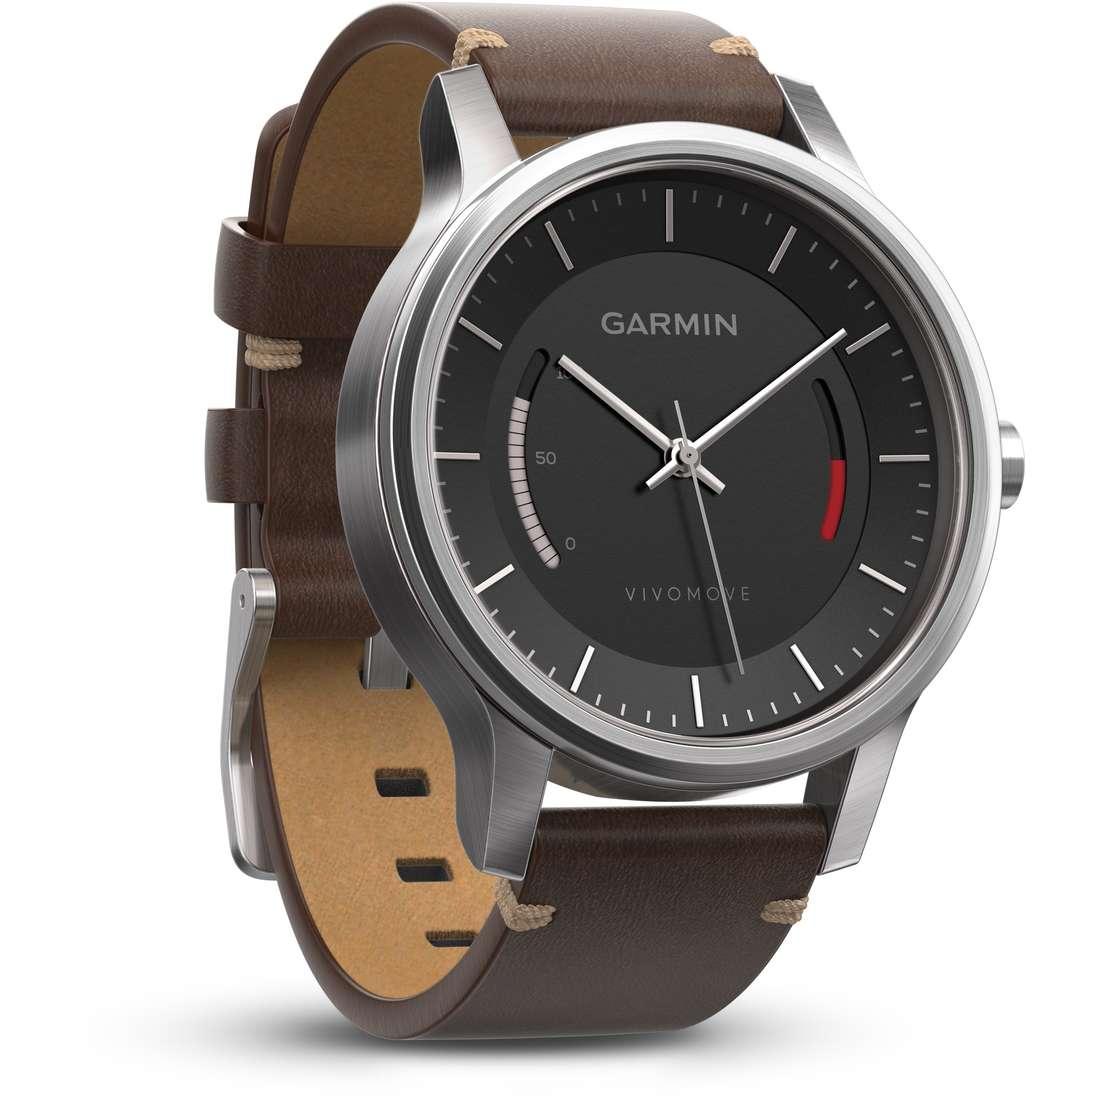 watch Smartwatch man Garmin Vivomove 010-01597-20